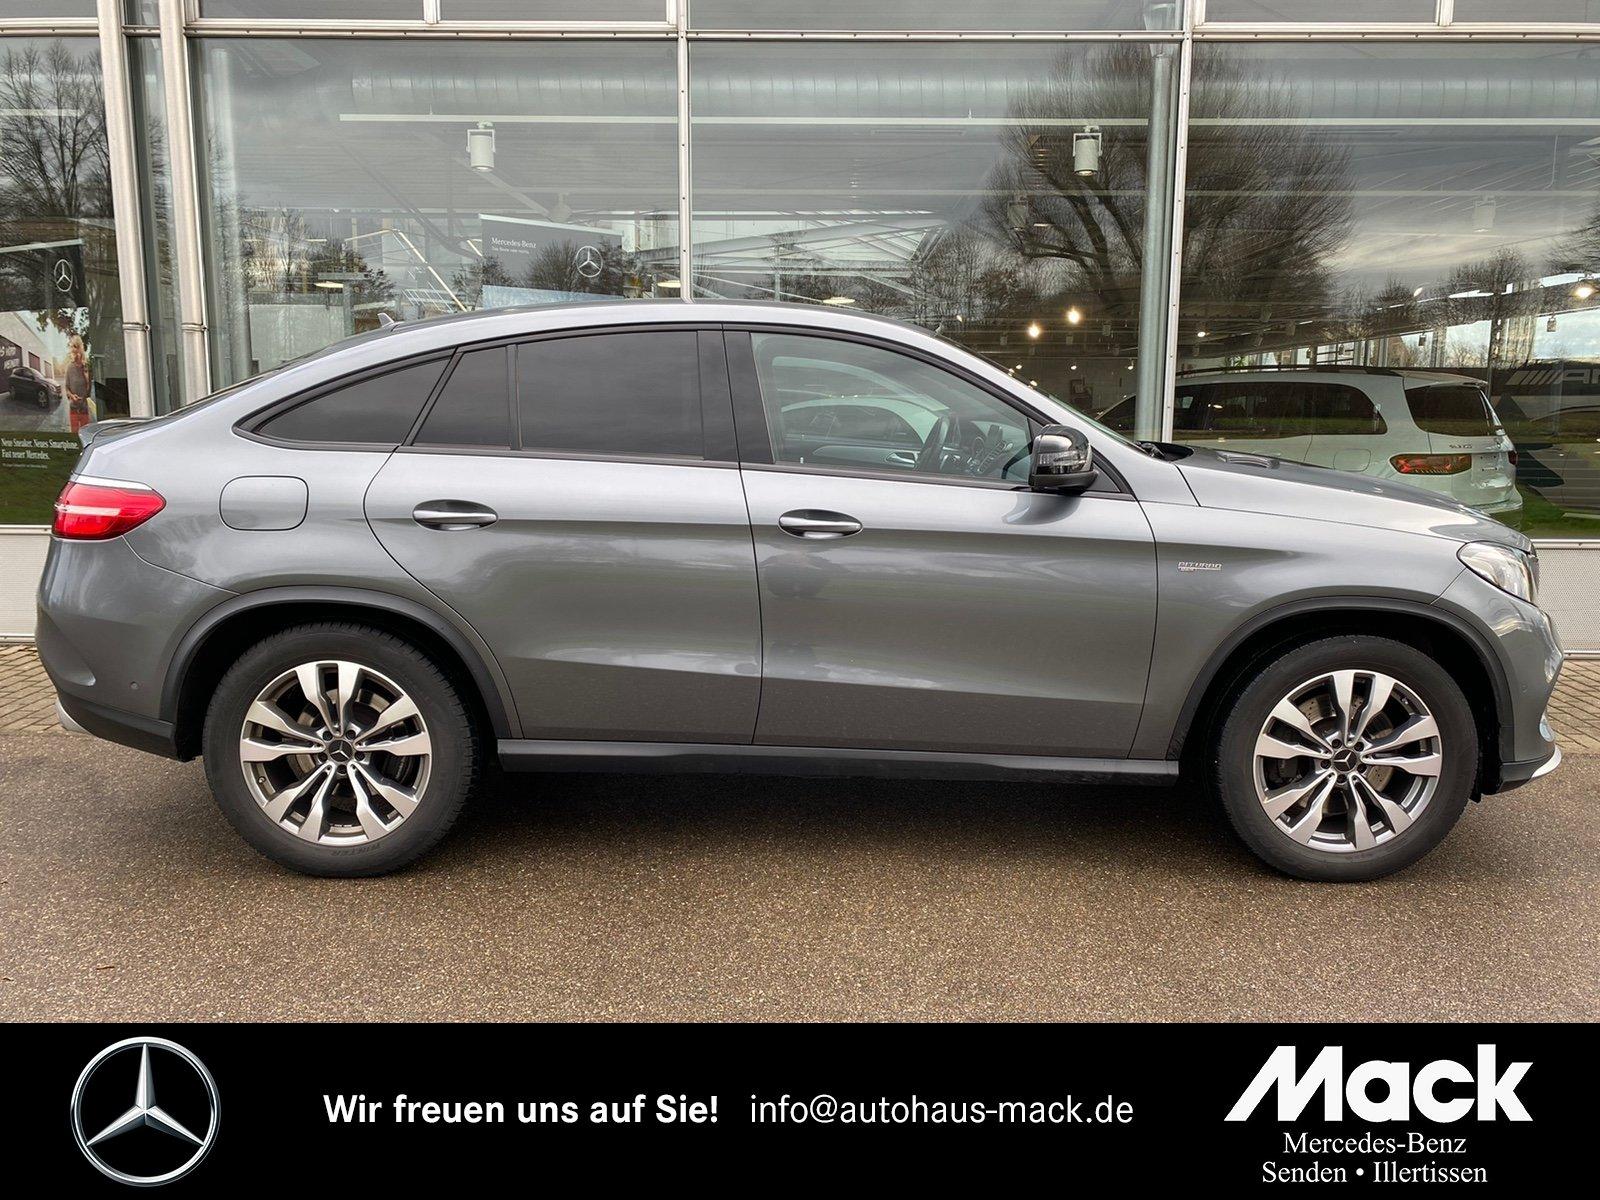 Mercedes-Benz GLE 43 AMG 4M Coupé ILS*360°-Kamera*Nappa-Leder, Jahr 2016, Benzin